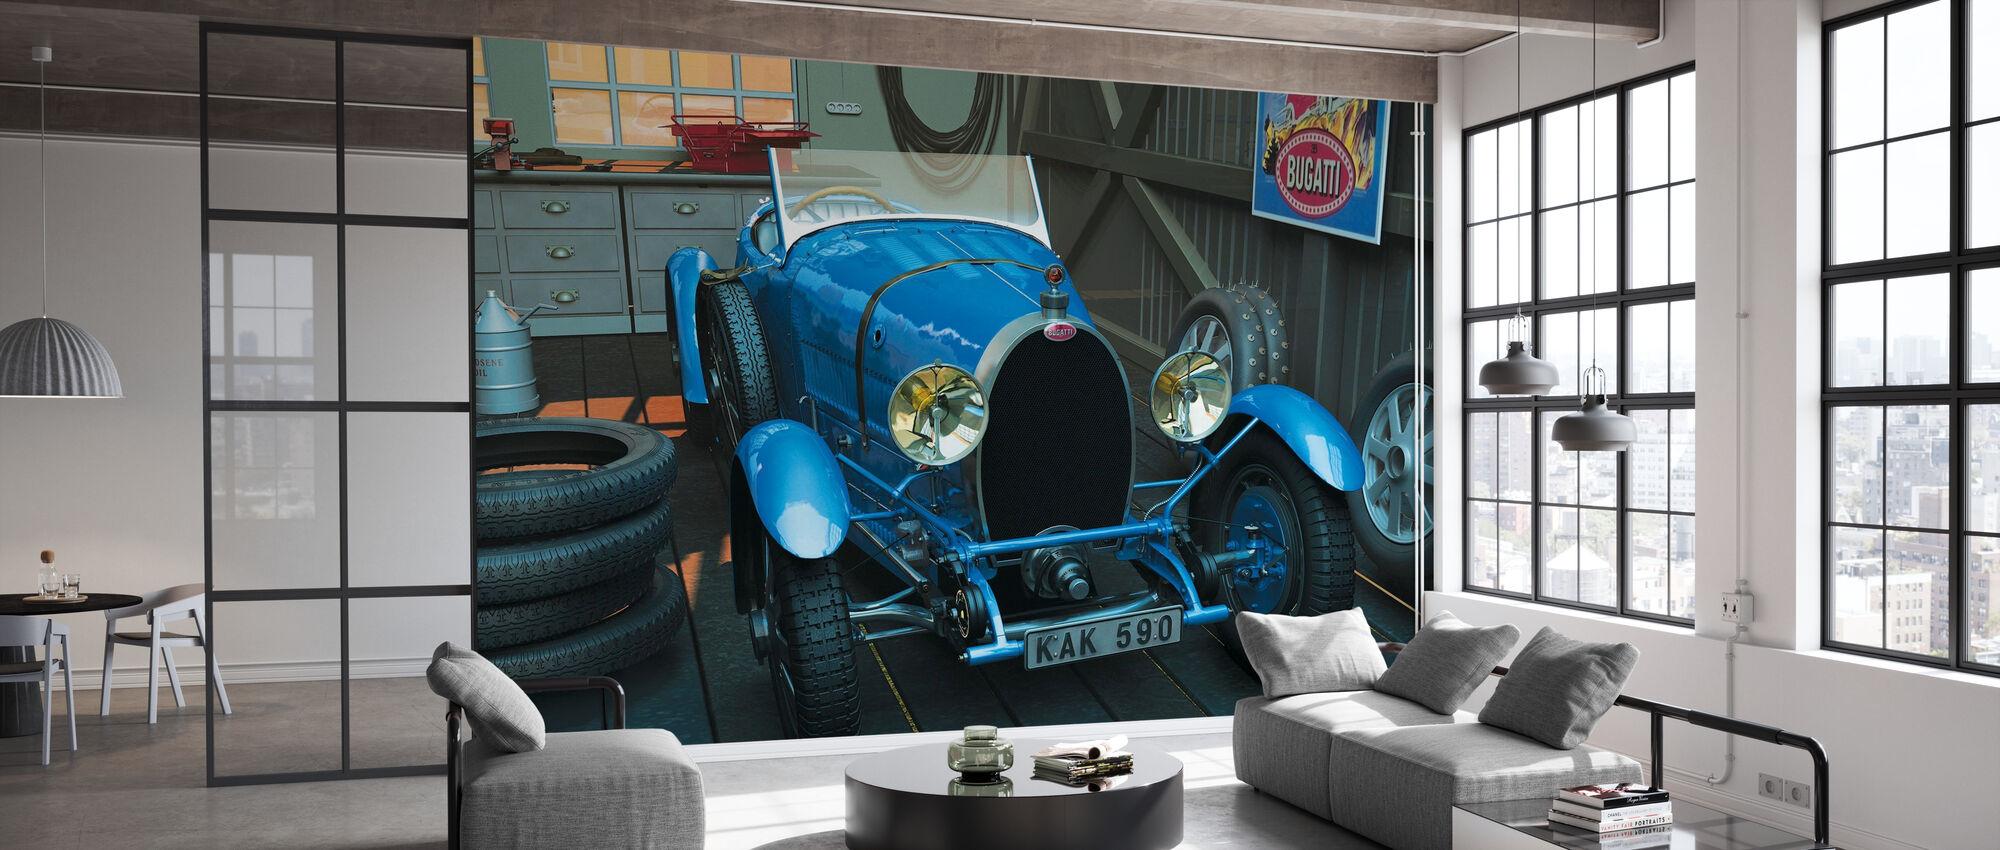 Car in the Garage - Wallpaper - Office